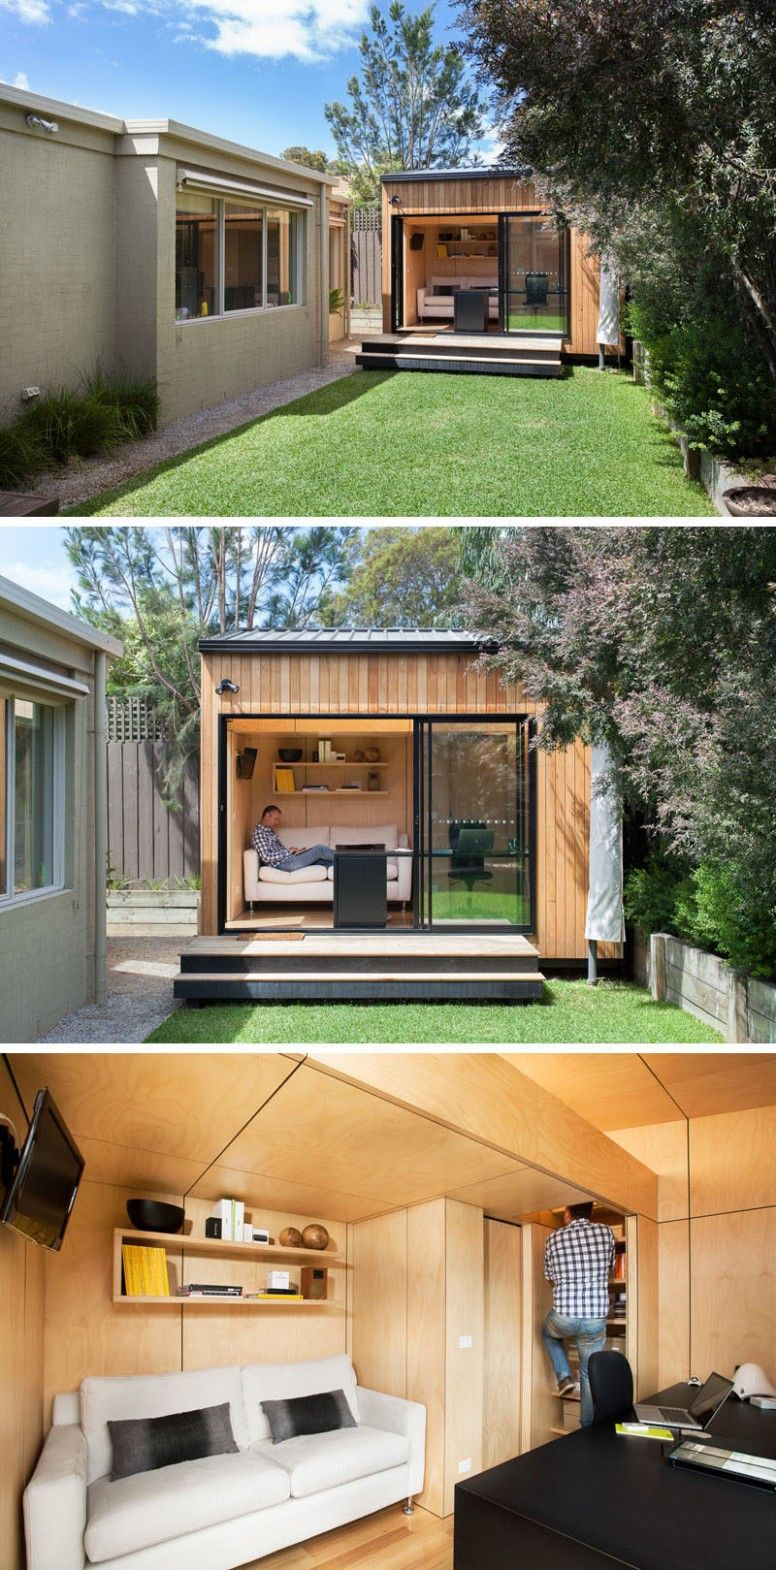 Modern Tiny Home Backyard Arsitektur Arsitektur Rumah Rumah Mini backyard guest house